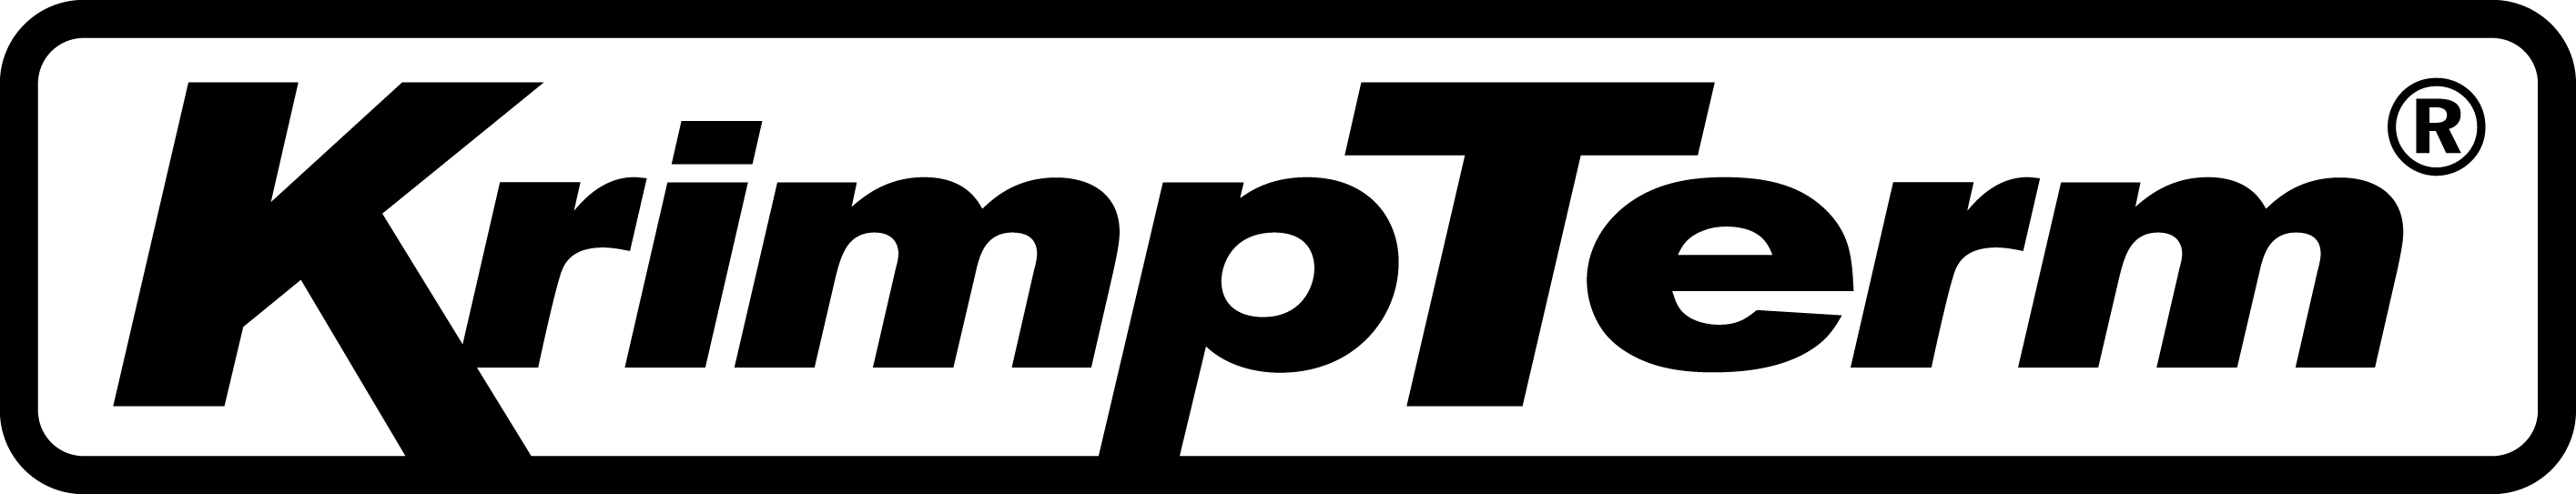 Krimpterm Product Cable Management Grommets Wiring White